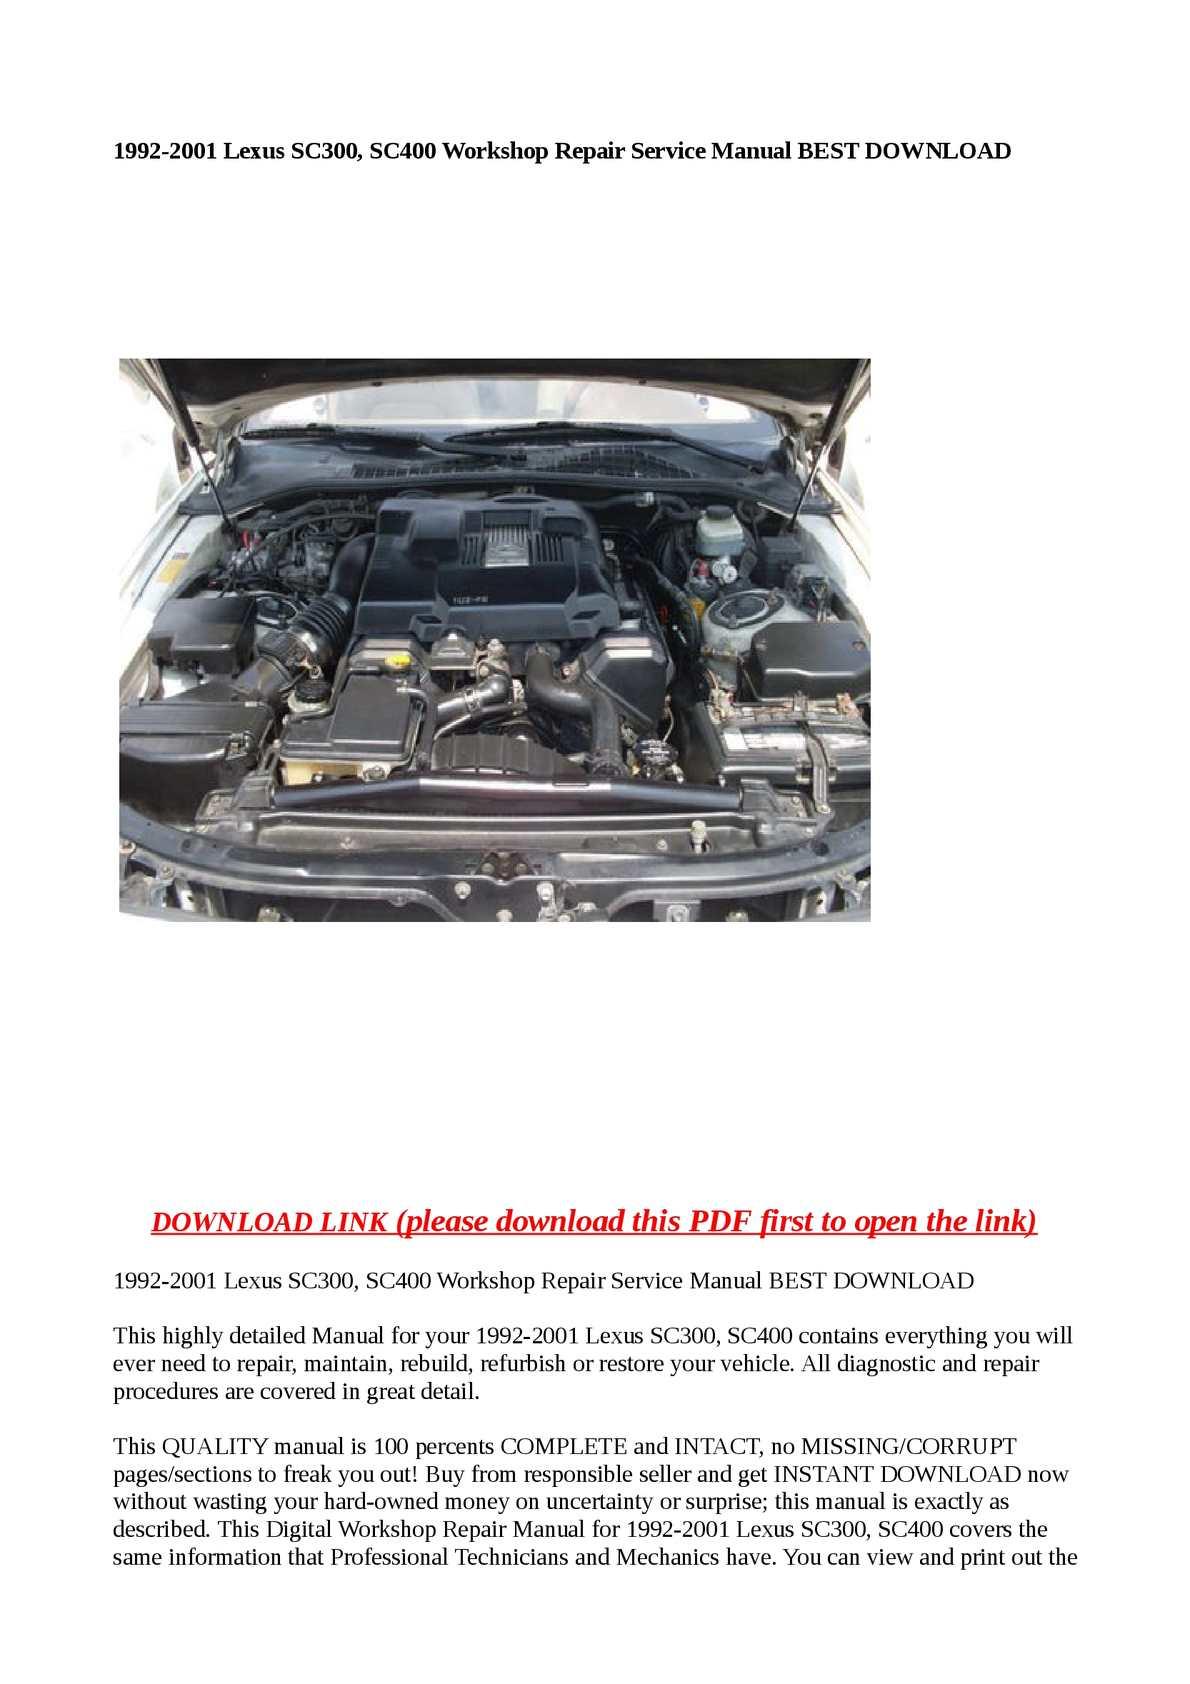 1997 lexus sc300 owners manual